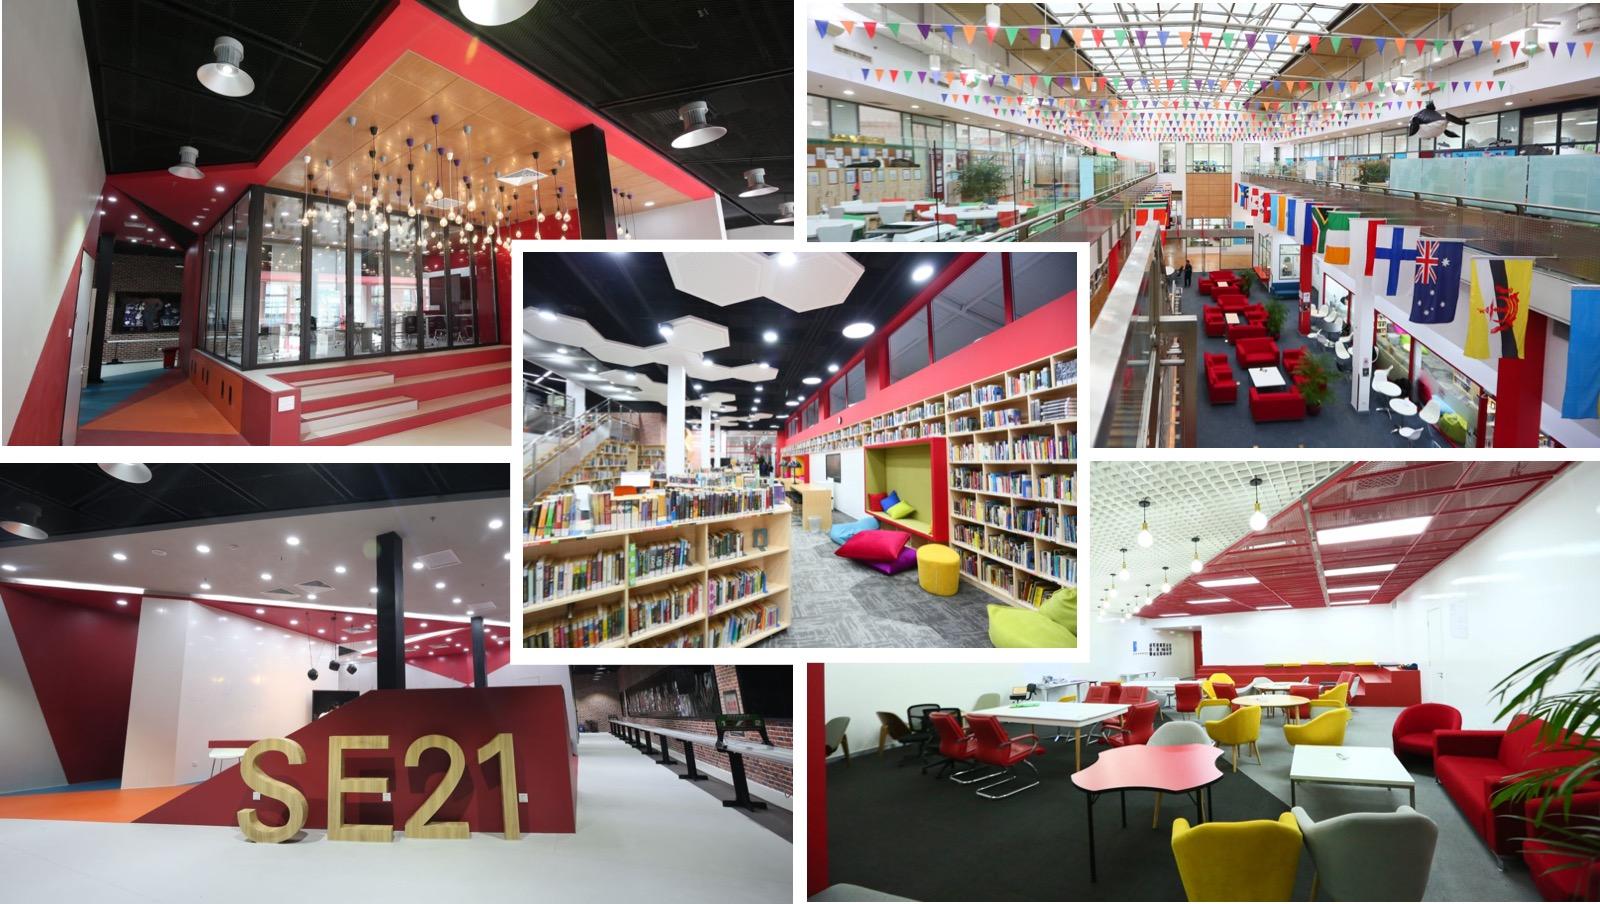 ss-facilities-Dulwich_College_Beijing-20200731-171921-55